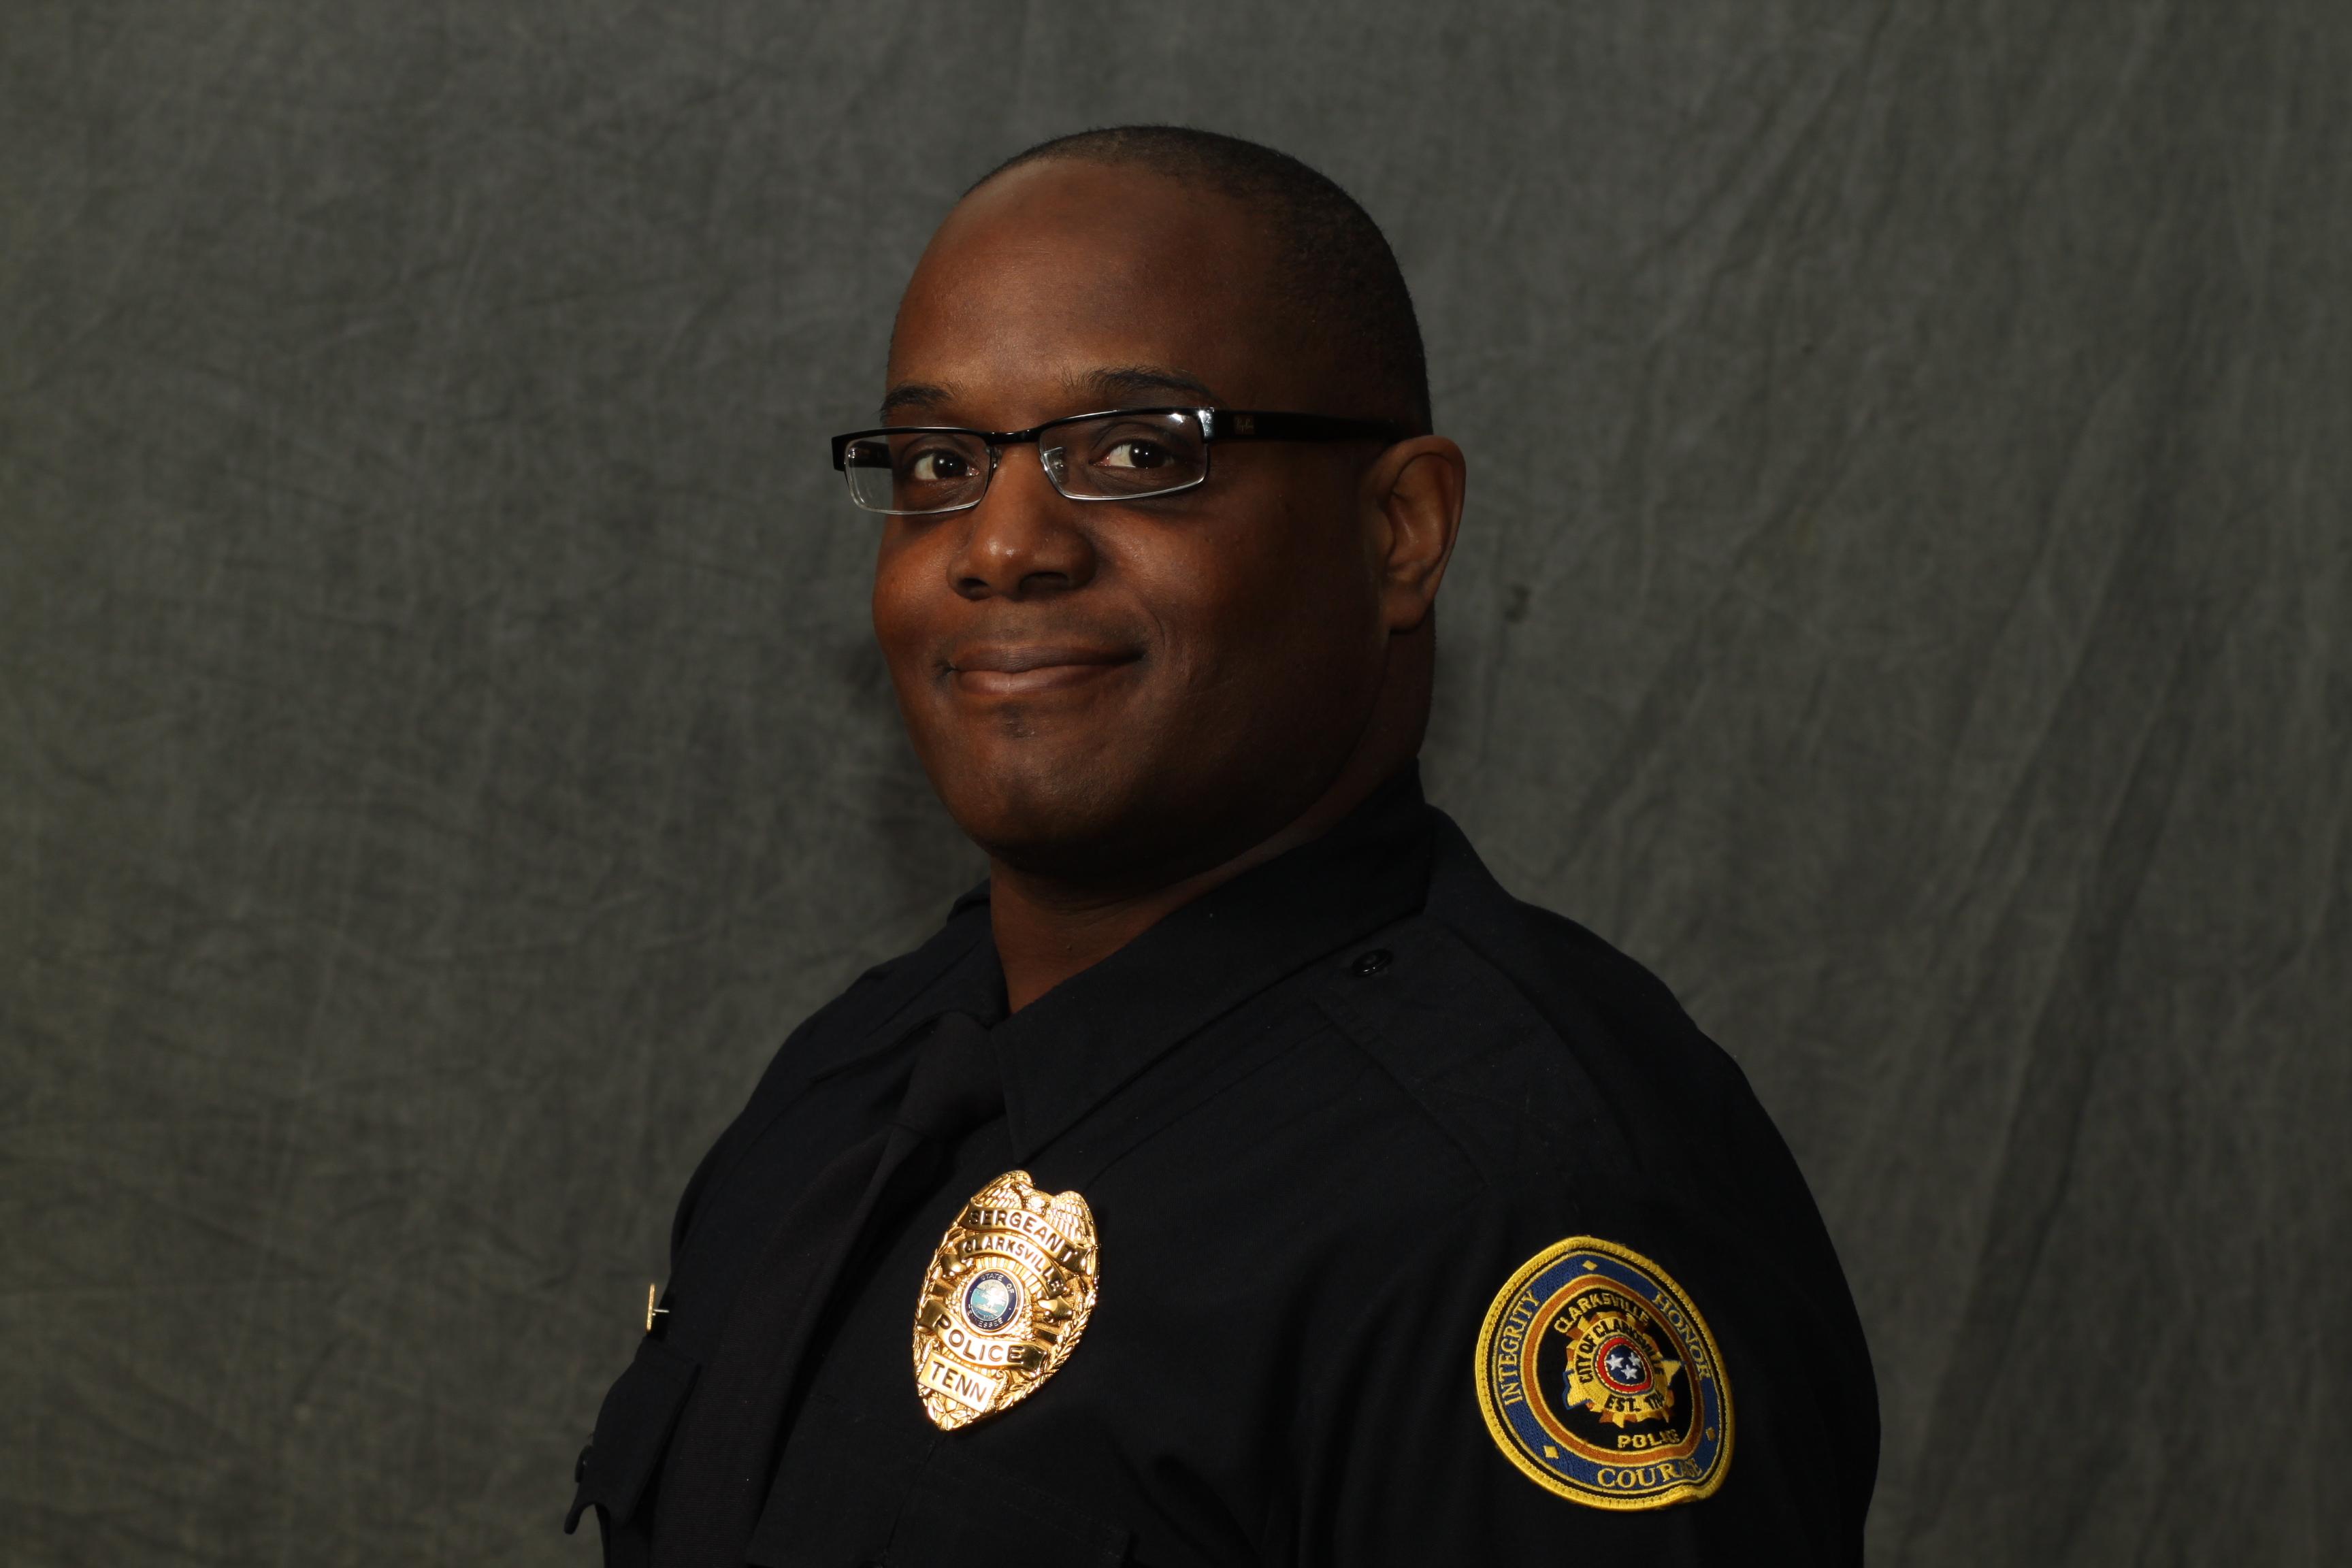 Sergeant David Miller   Clarksville Police Department, Tennessee